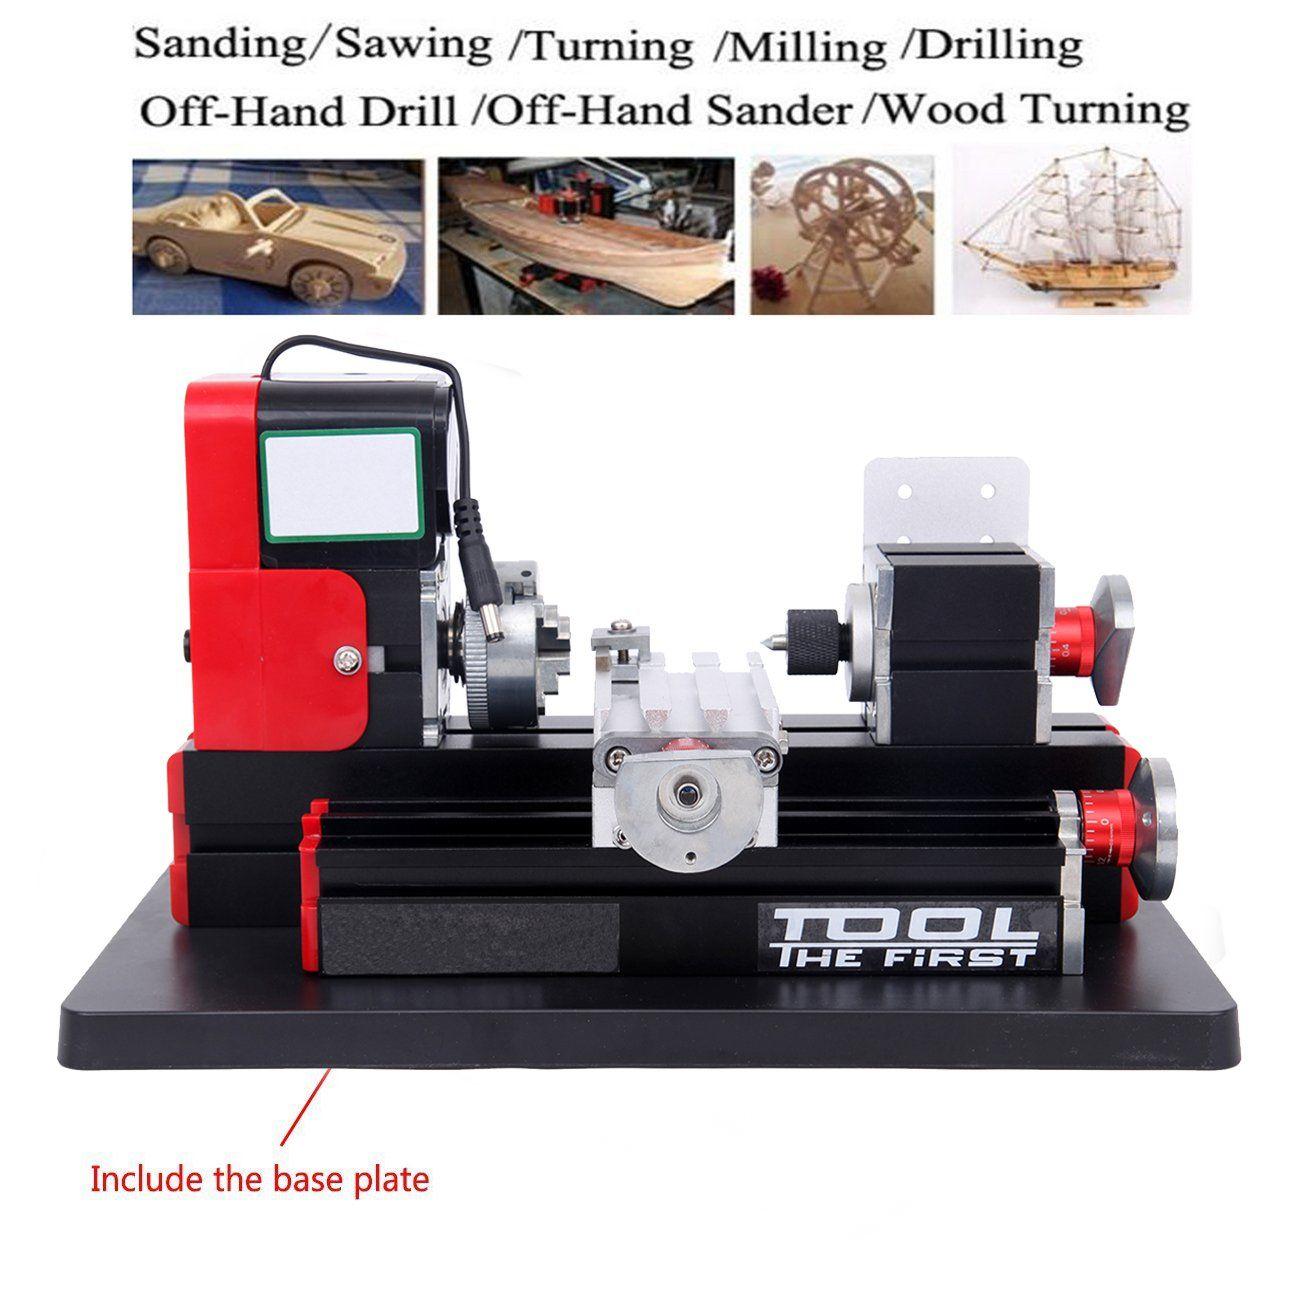 Metal Mini Milling Machine Metalworking DIY Woodworking Power Tools Modelmaking